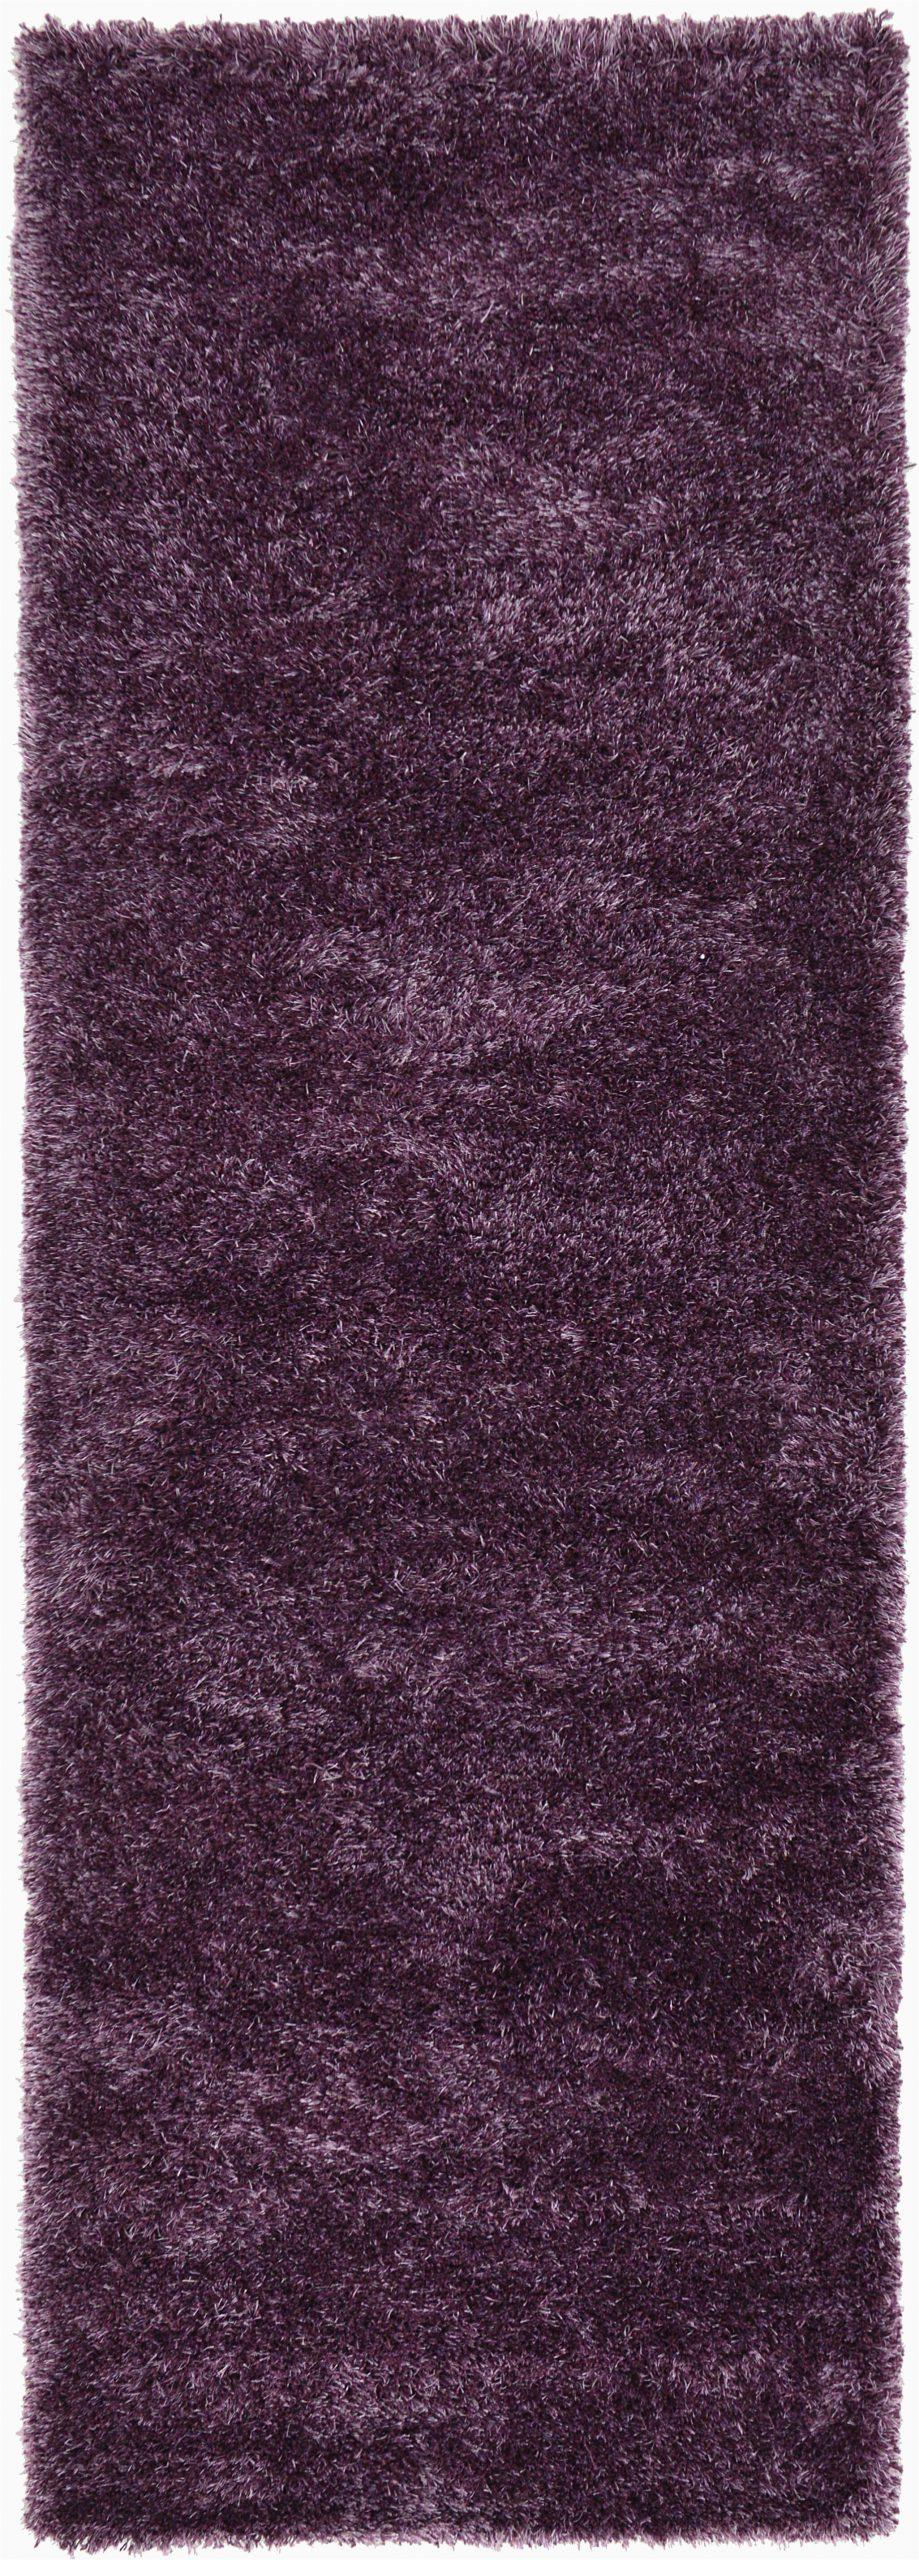 Purple area Rug for Bedroom Evelyn Fig Purple area Rug